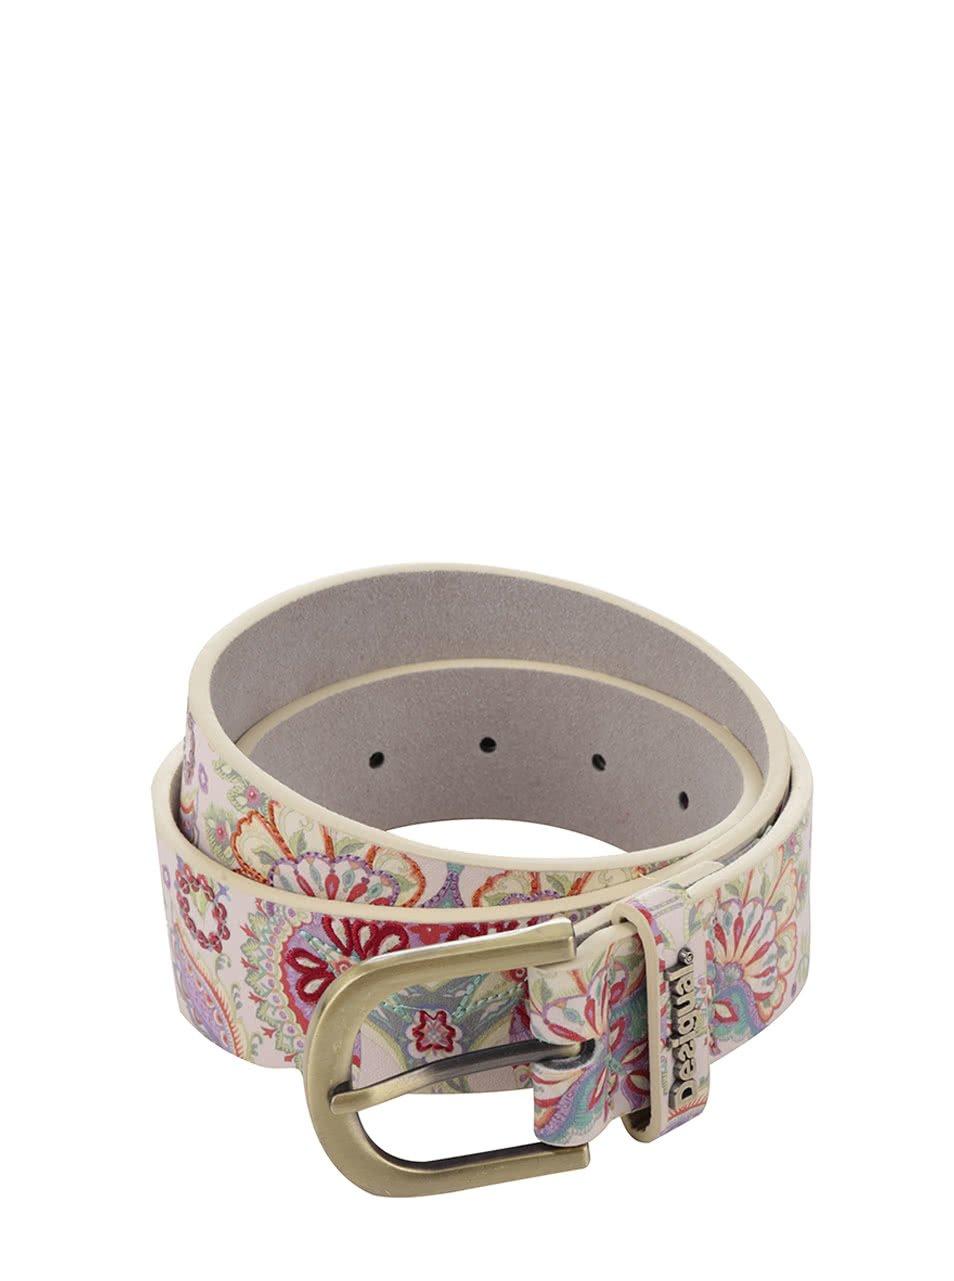 Béžový pásek s barevným vzorem Desigual Valkiri